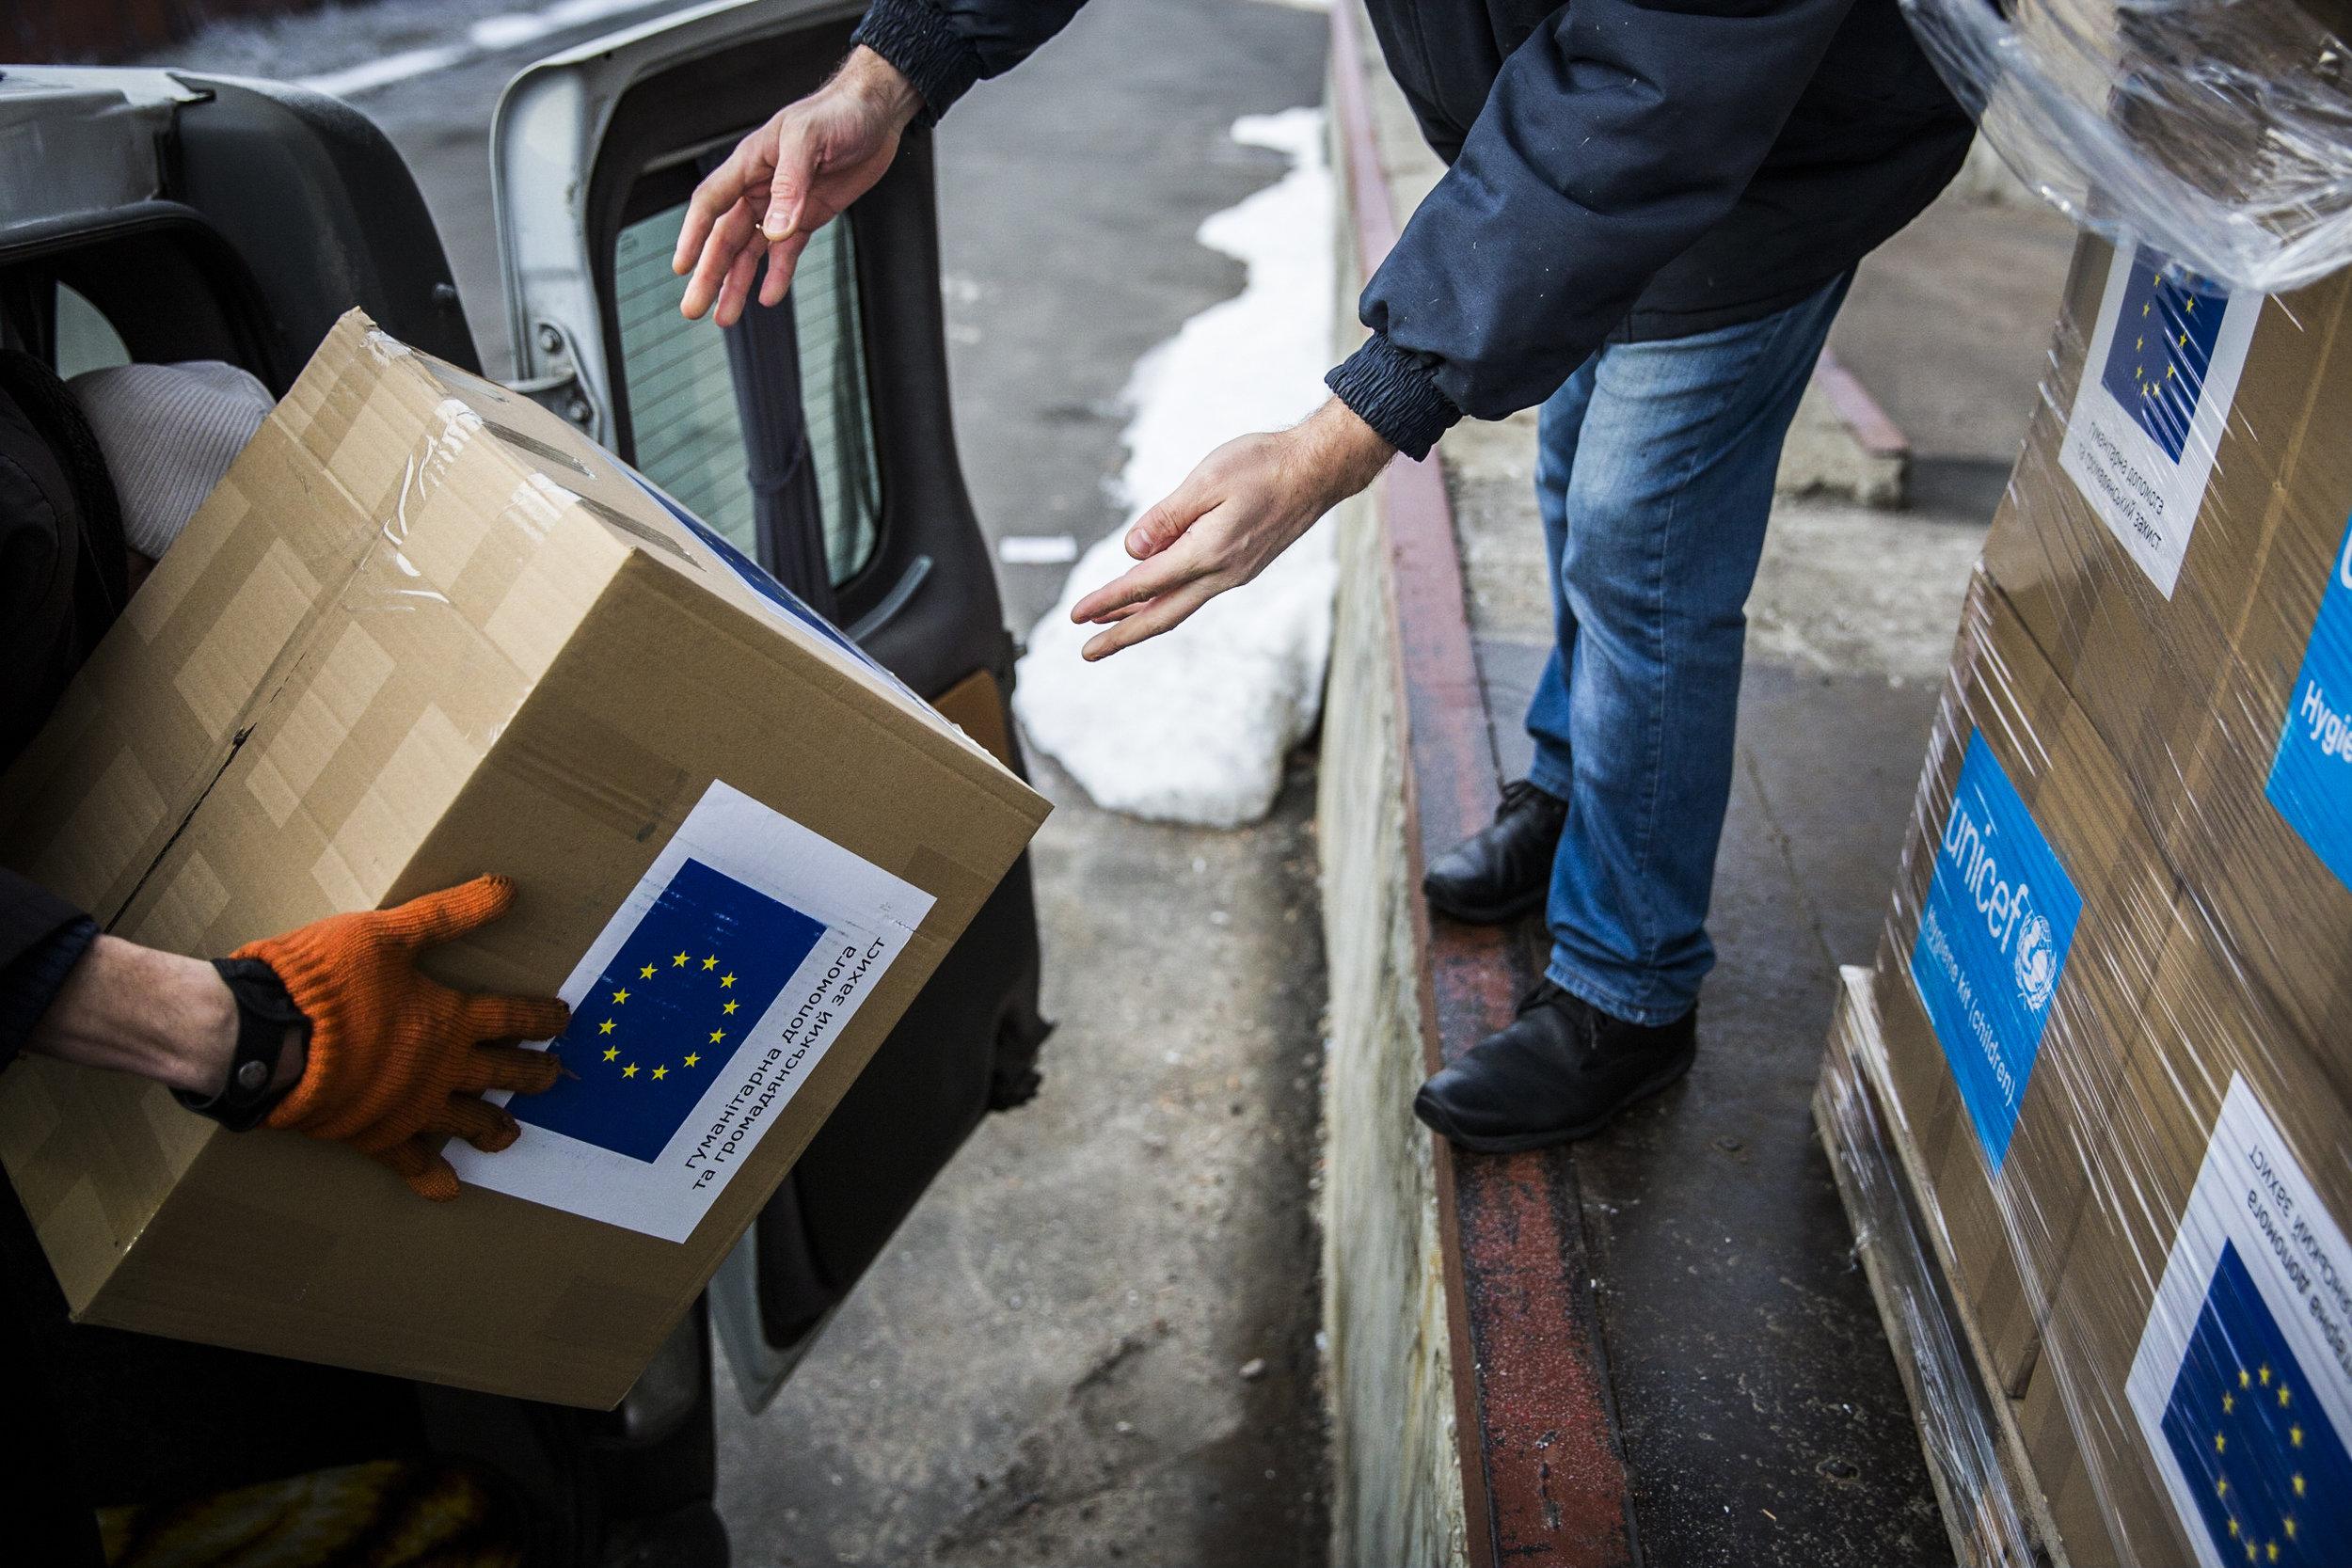 FRANCESCAVOLPI_UNICEF_EASTERN UKRAINE03.jpg